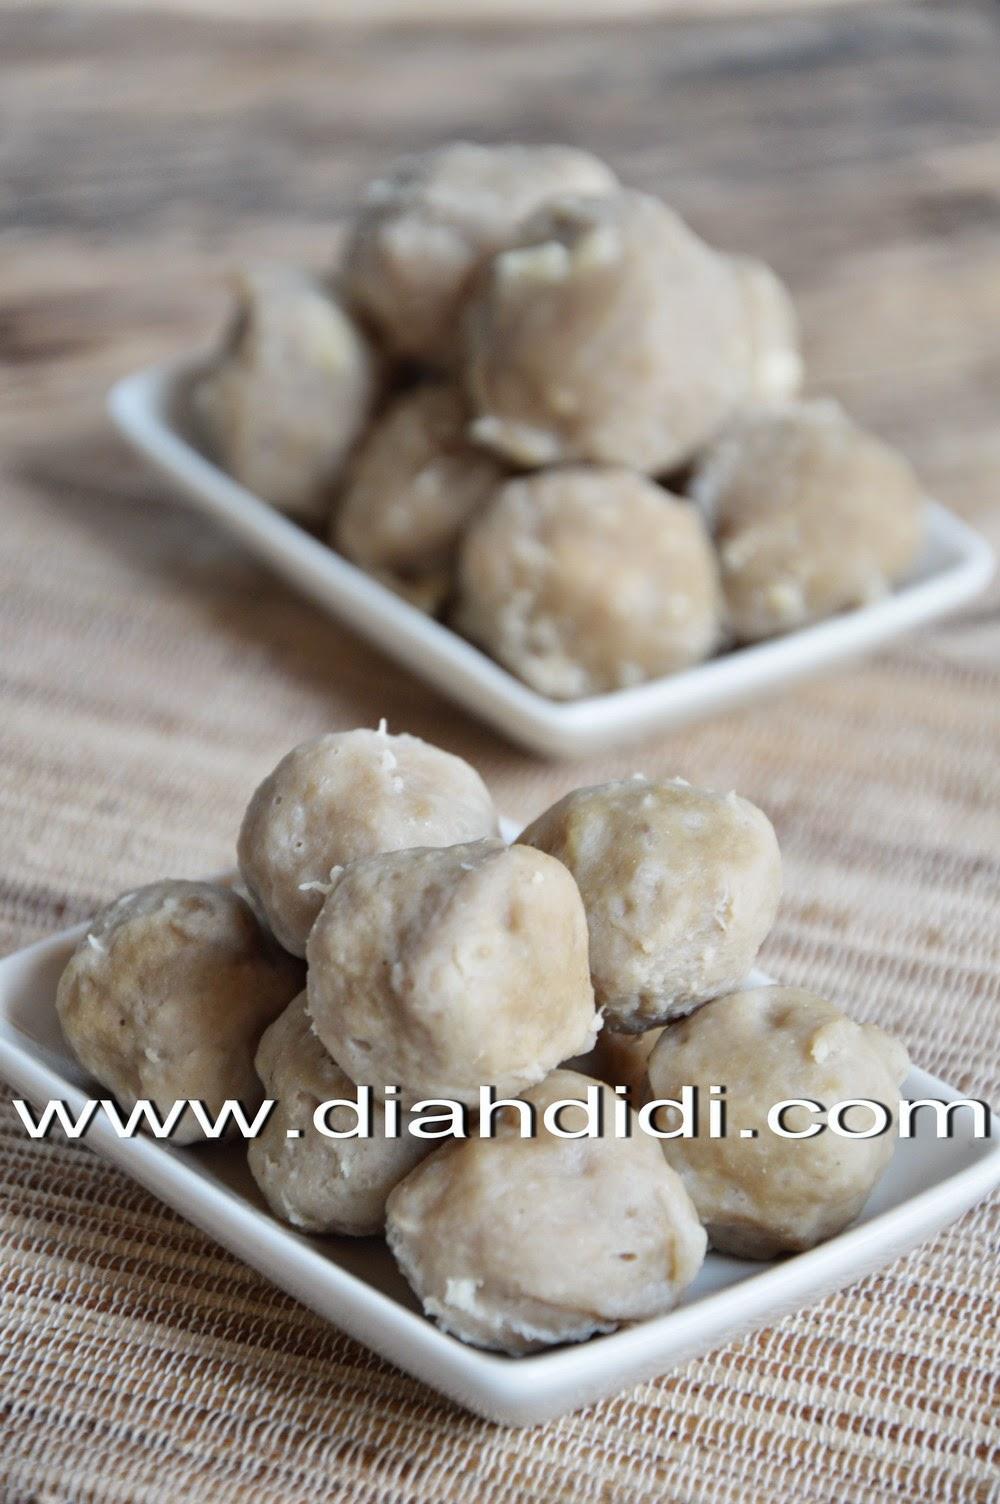 Resep Bakso Daging Sapi : resep, bakso, daging, Didi's, Kitchen:, Membuat, Bakso, Daging